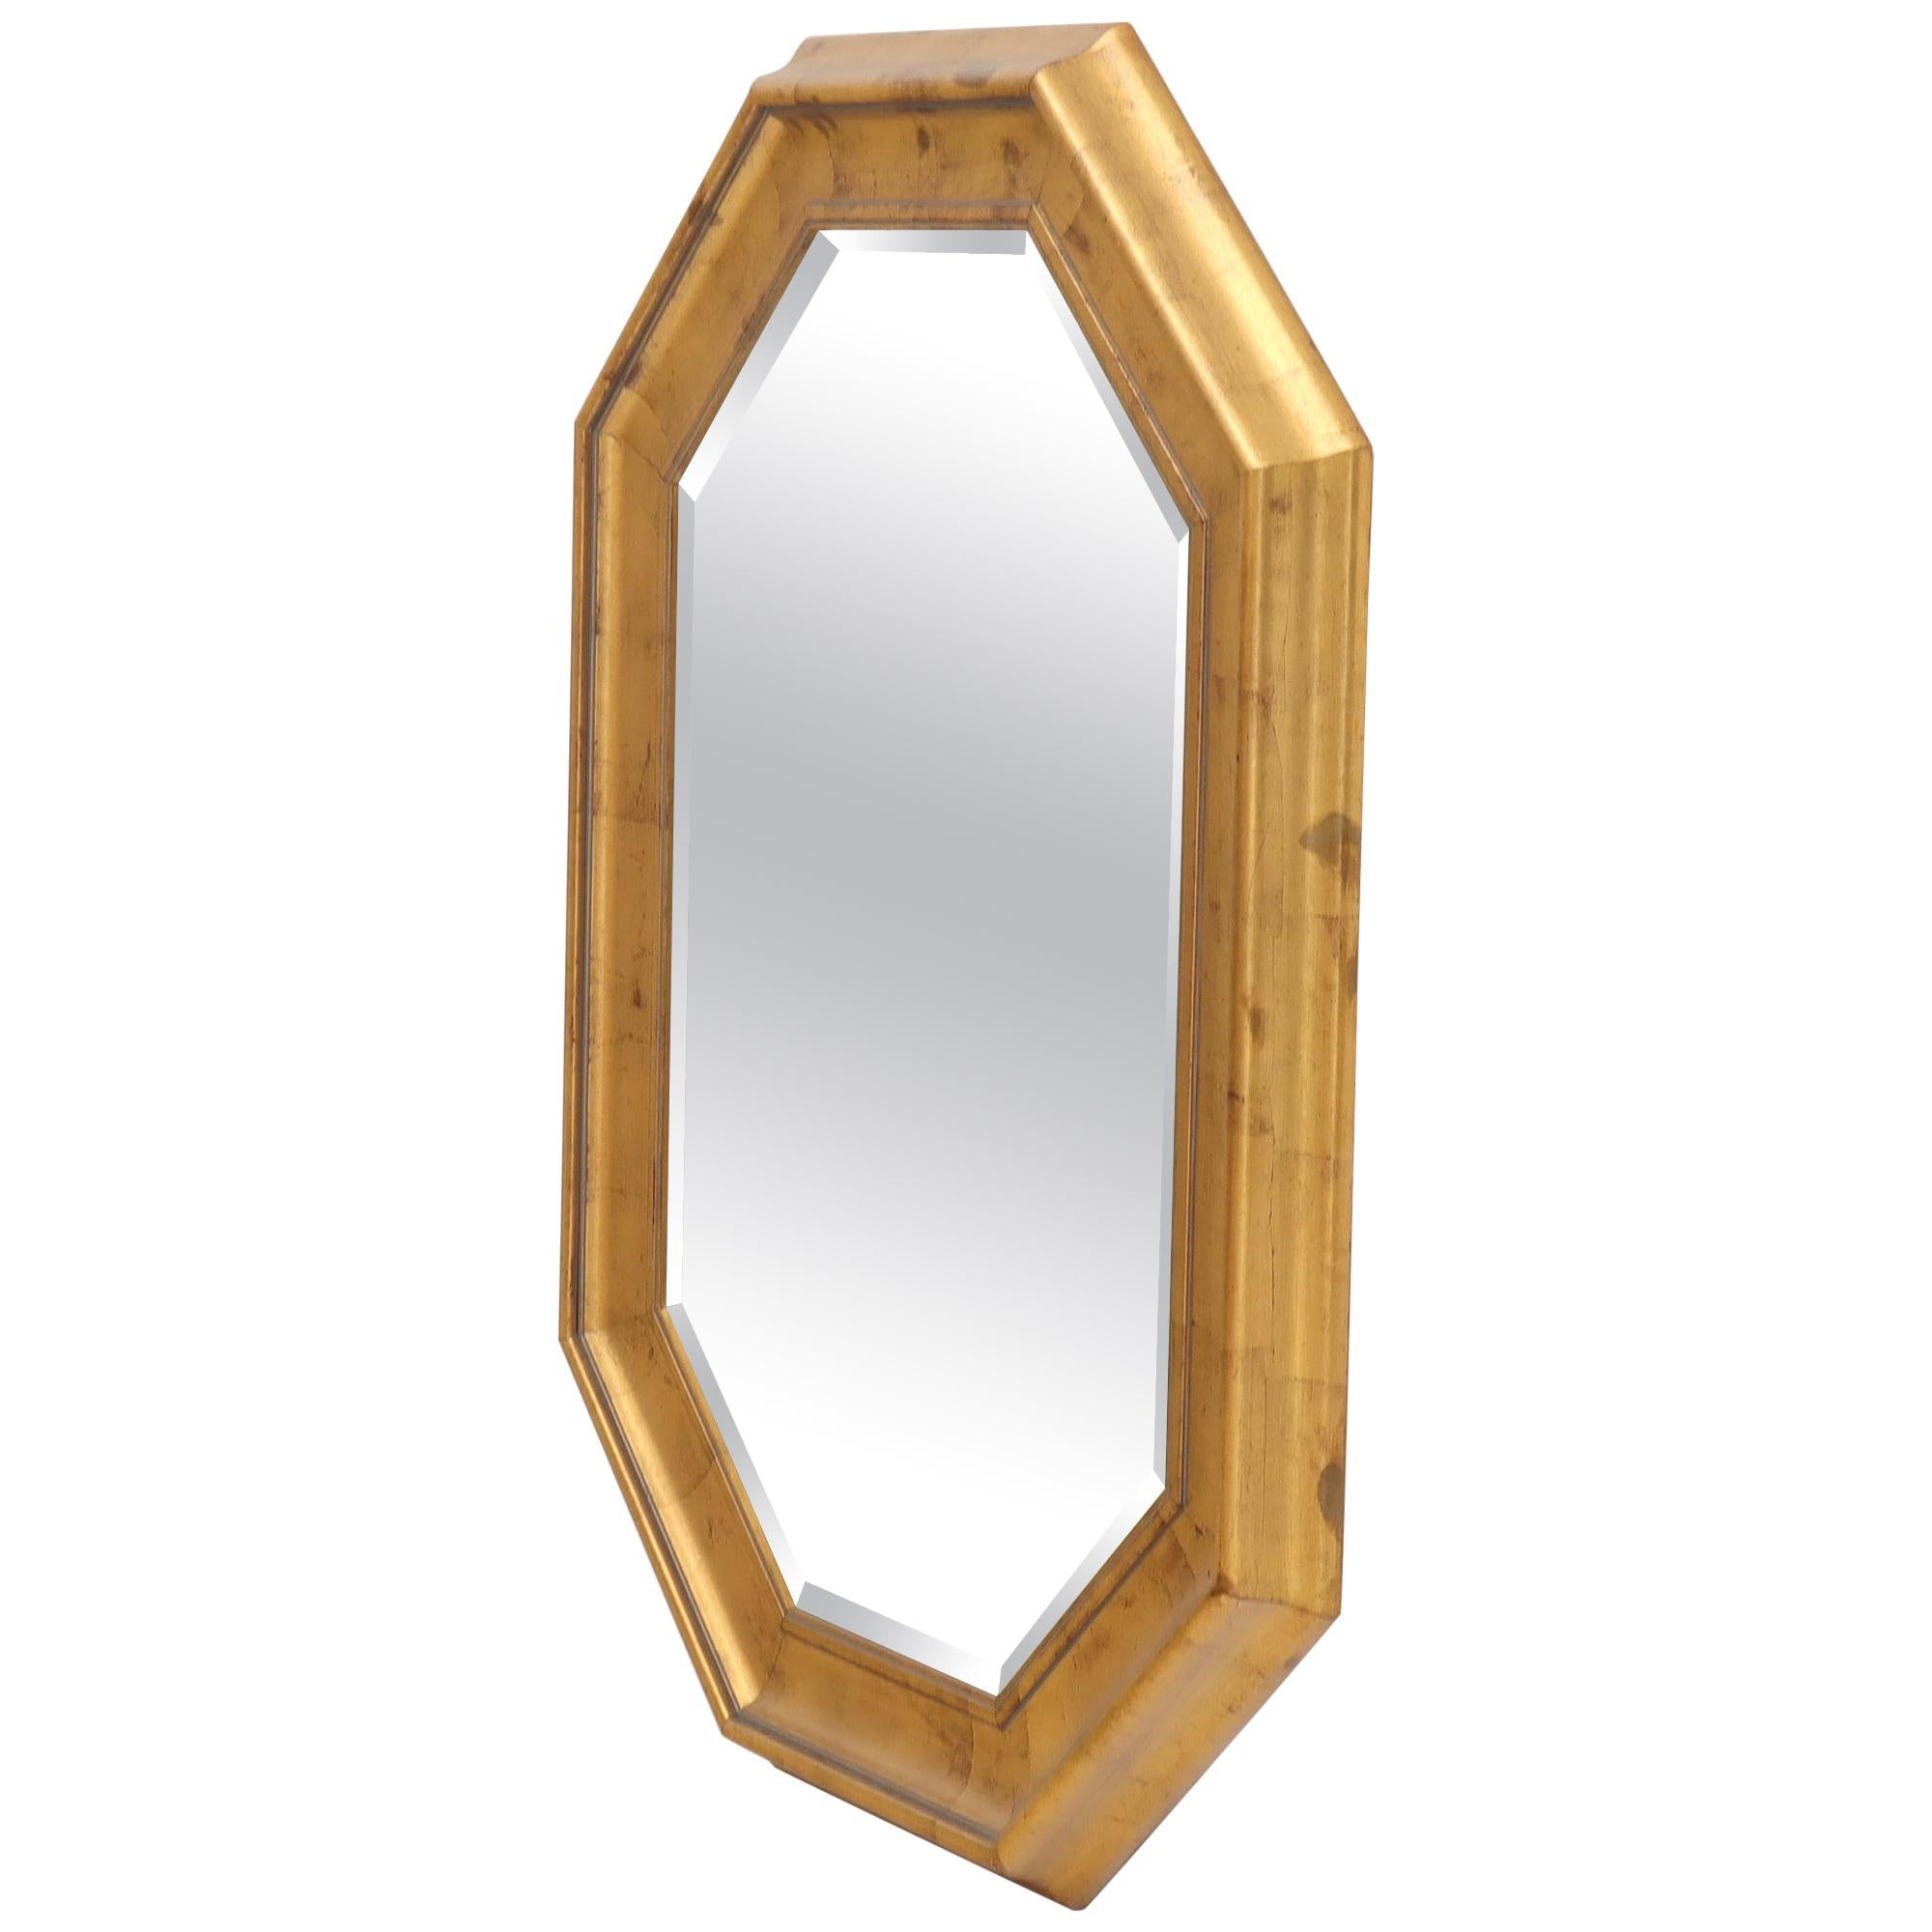 Decorative Octagon Gilt Frame Beveled Wall Mirror